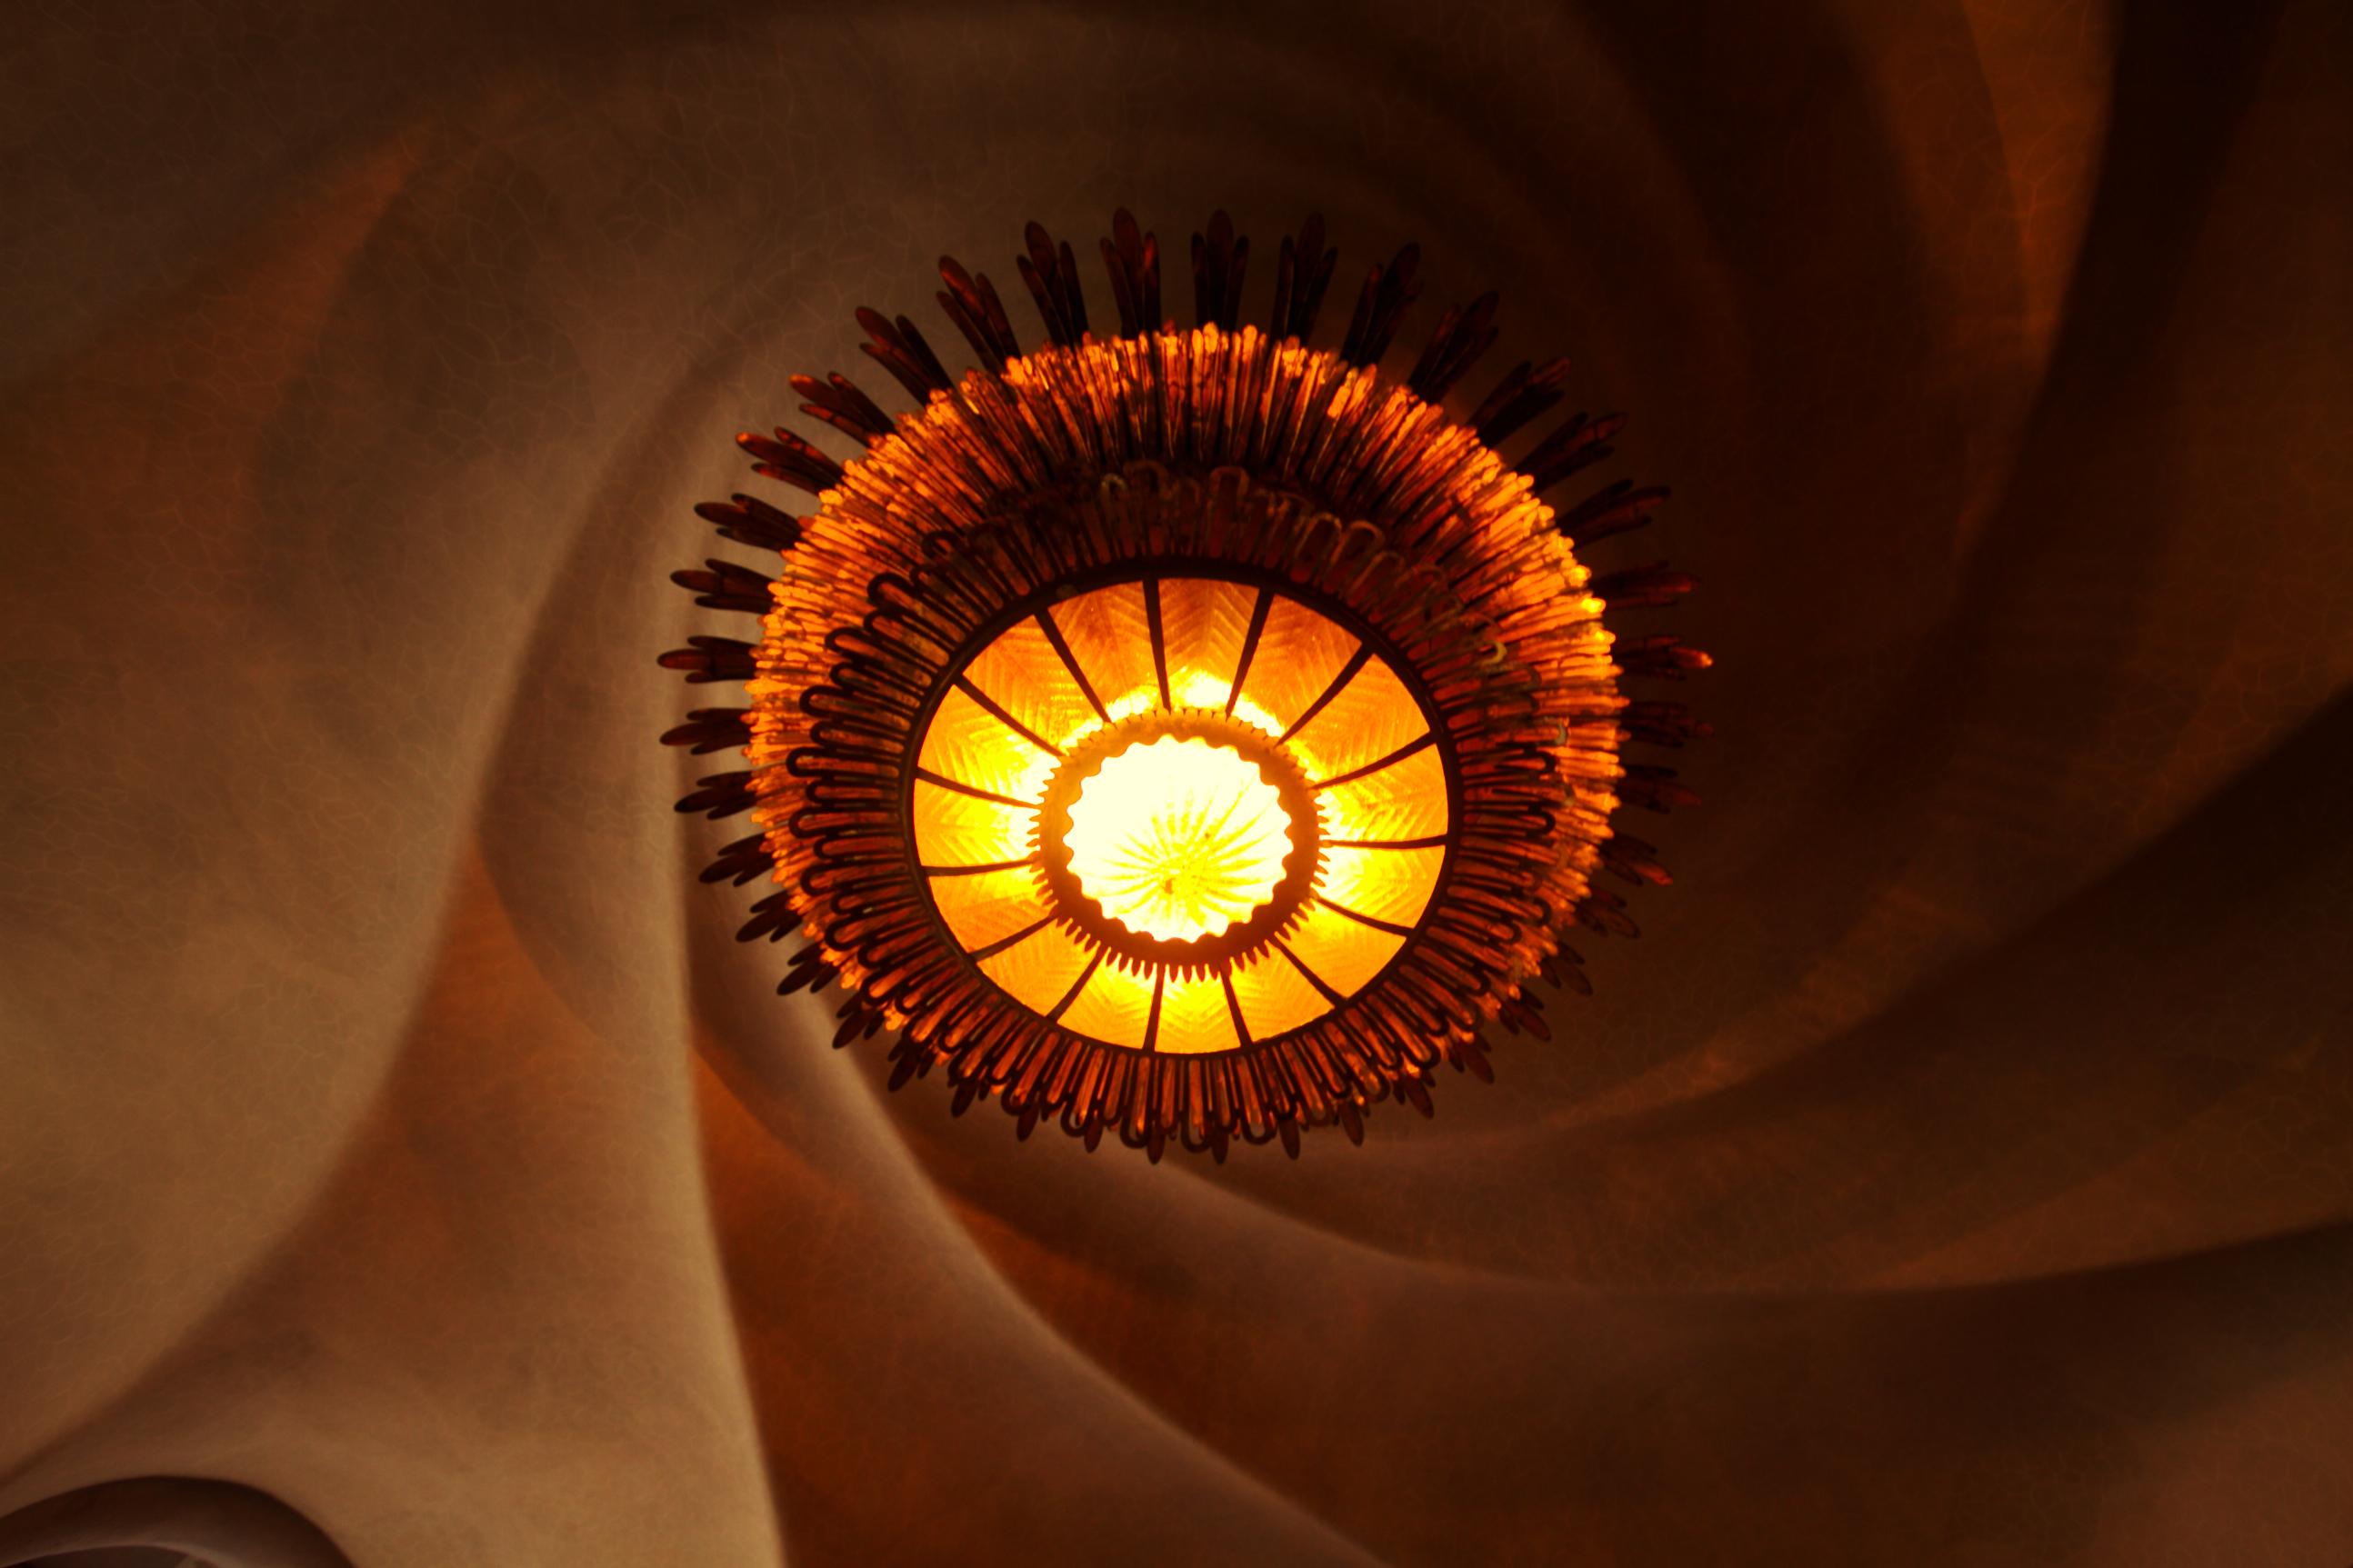 2588x1725 Filemain Light Fixture